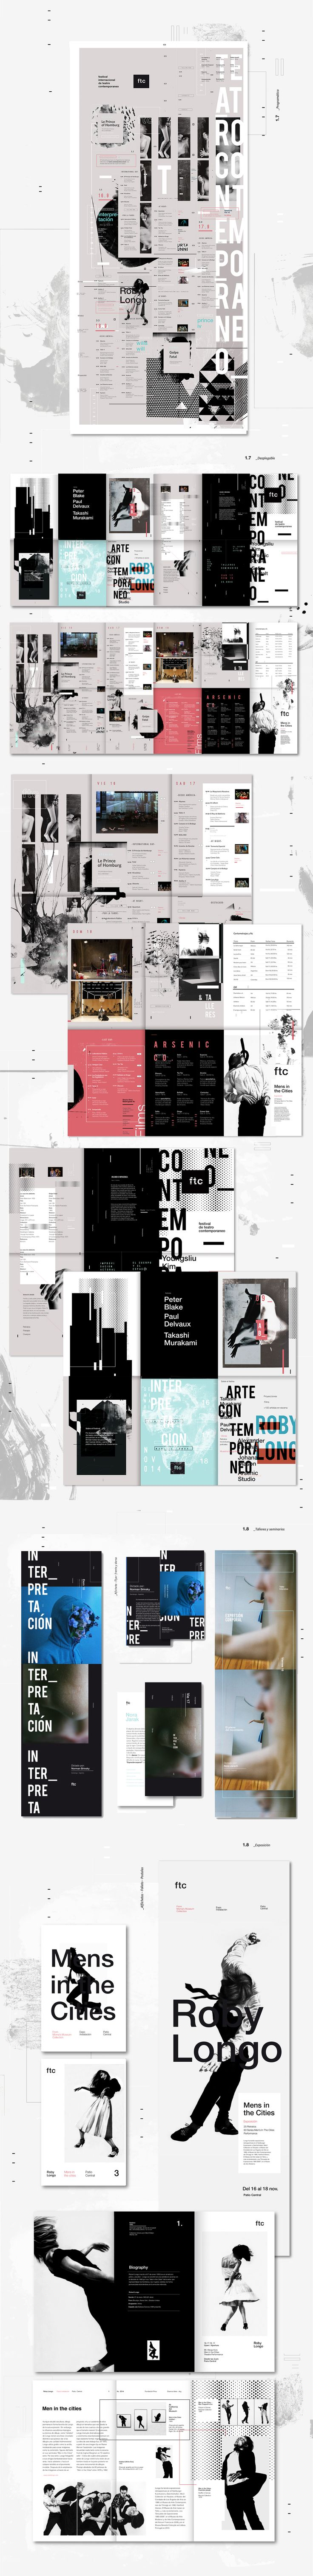 Ftc - Festival de Teatro Contemporáneo - Parte 2 on Behance